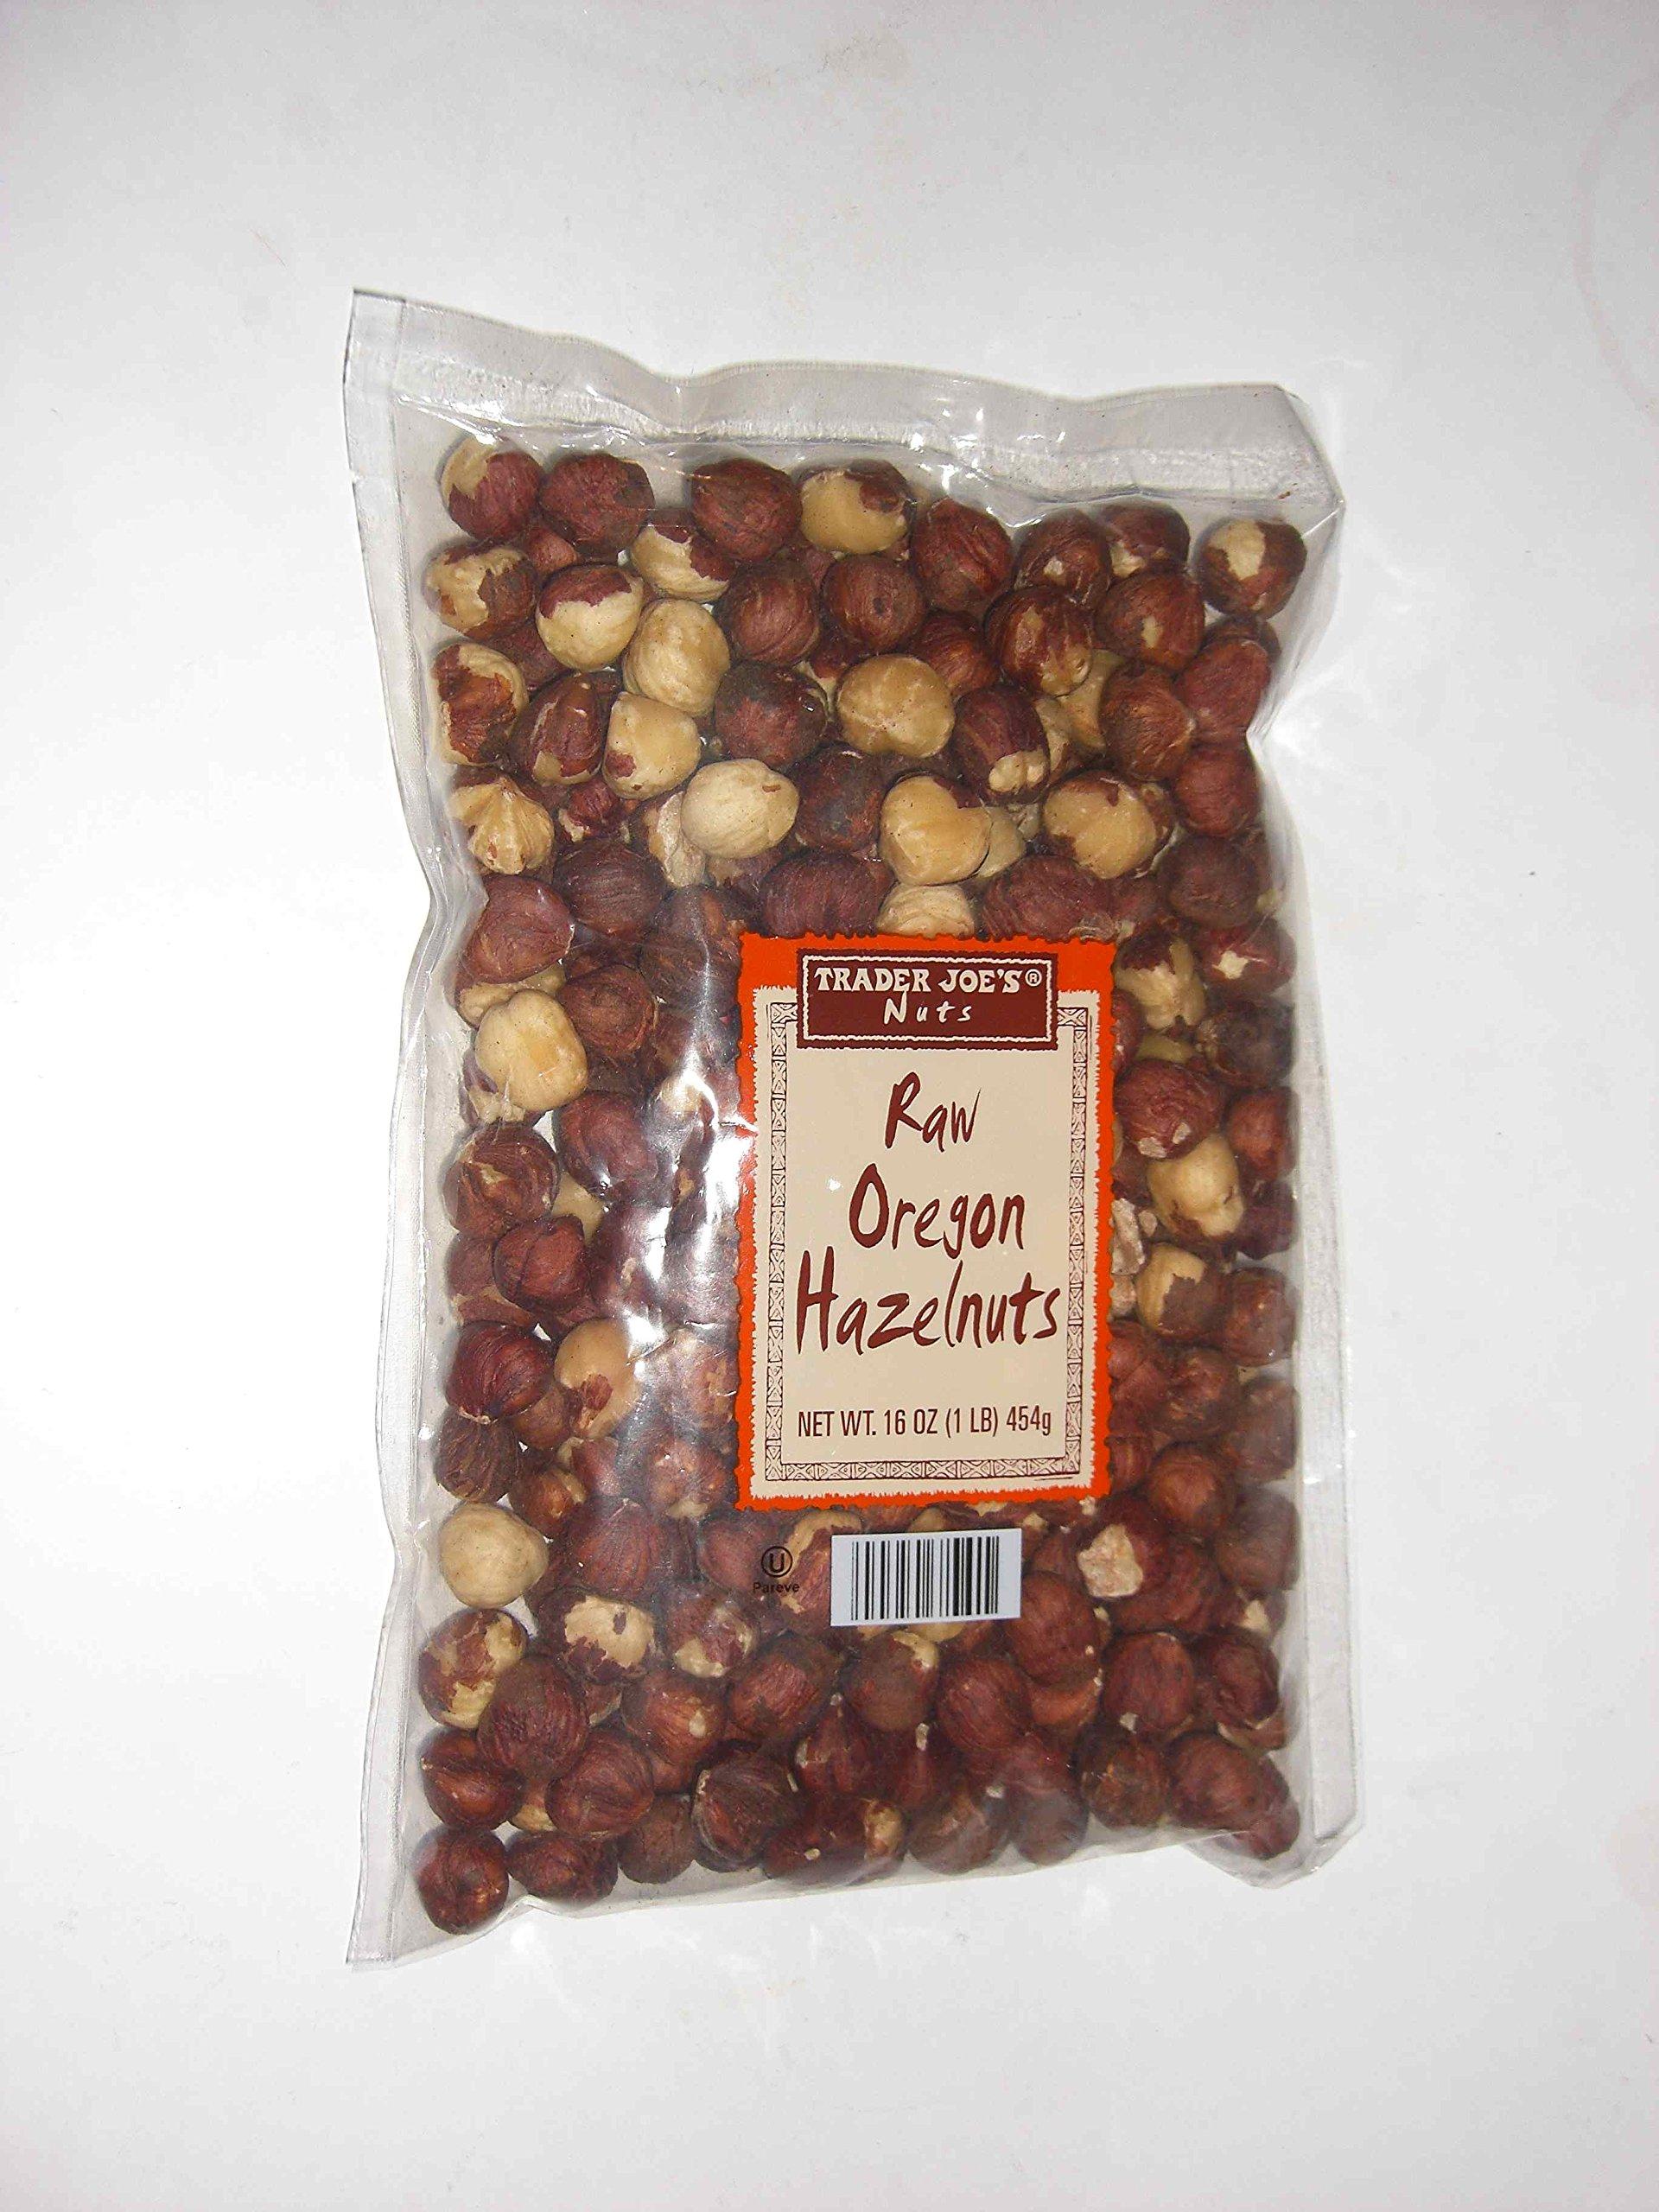 Trader Joe's Raw Oregon Hazelnuts, 16 oz.